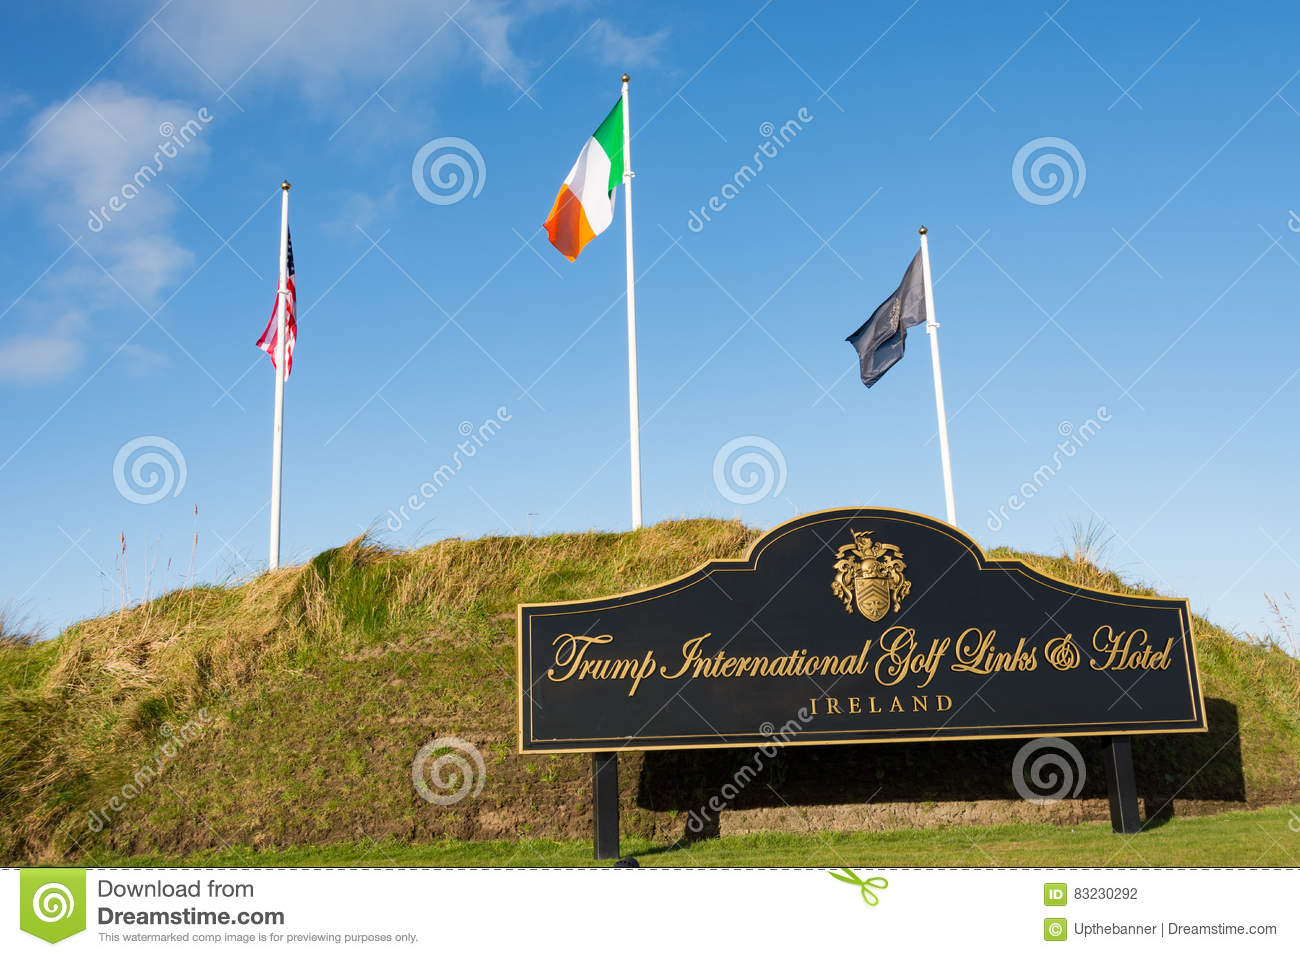 Doonbeg, Ireland.